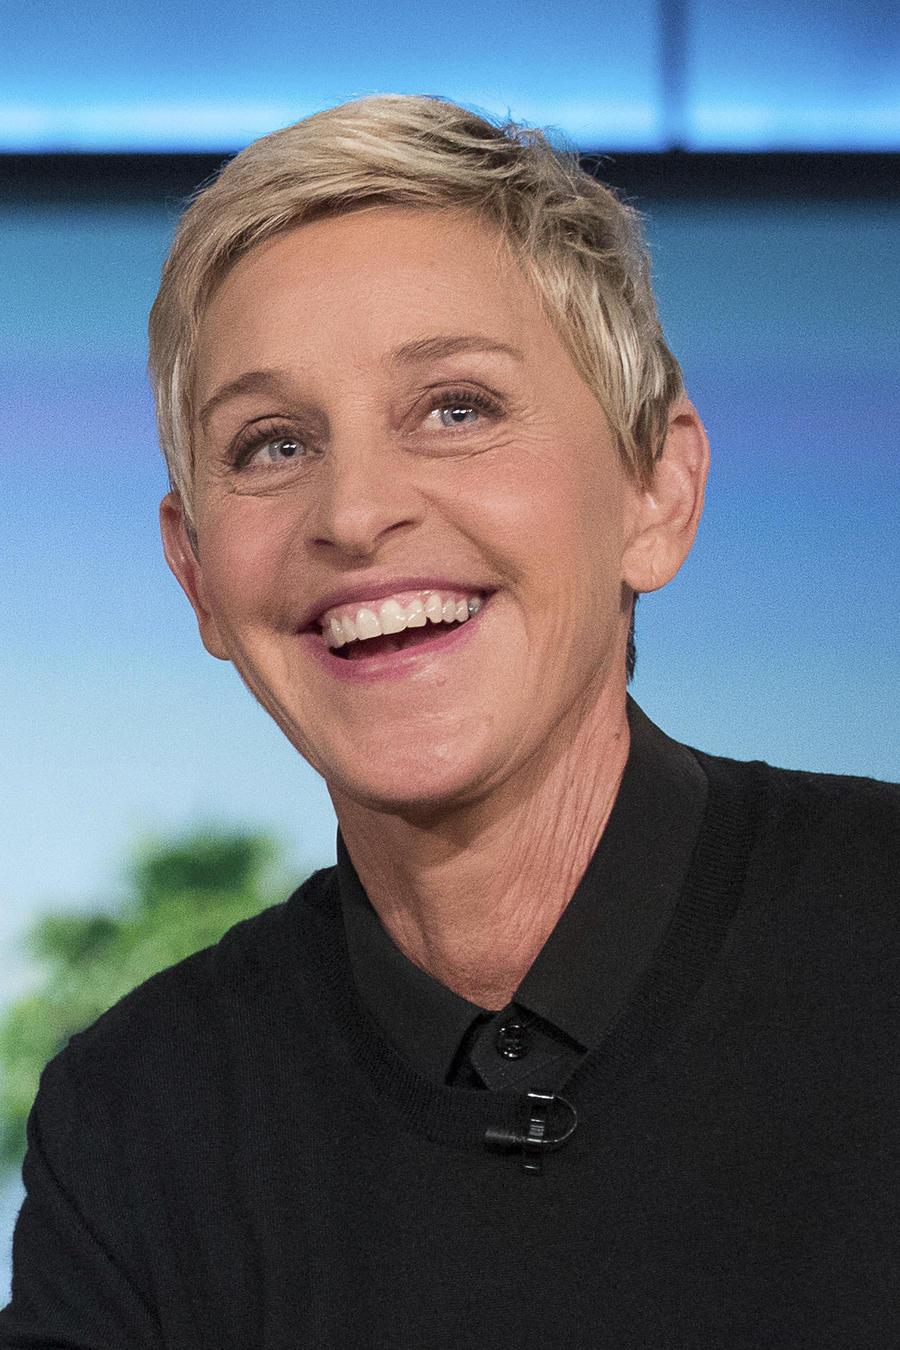 2020 Golden Globes: Ellen DeGeneres to Receive Carol Burnett Award